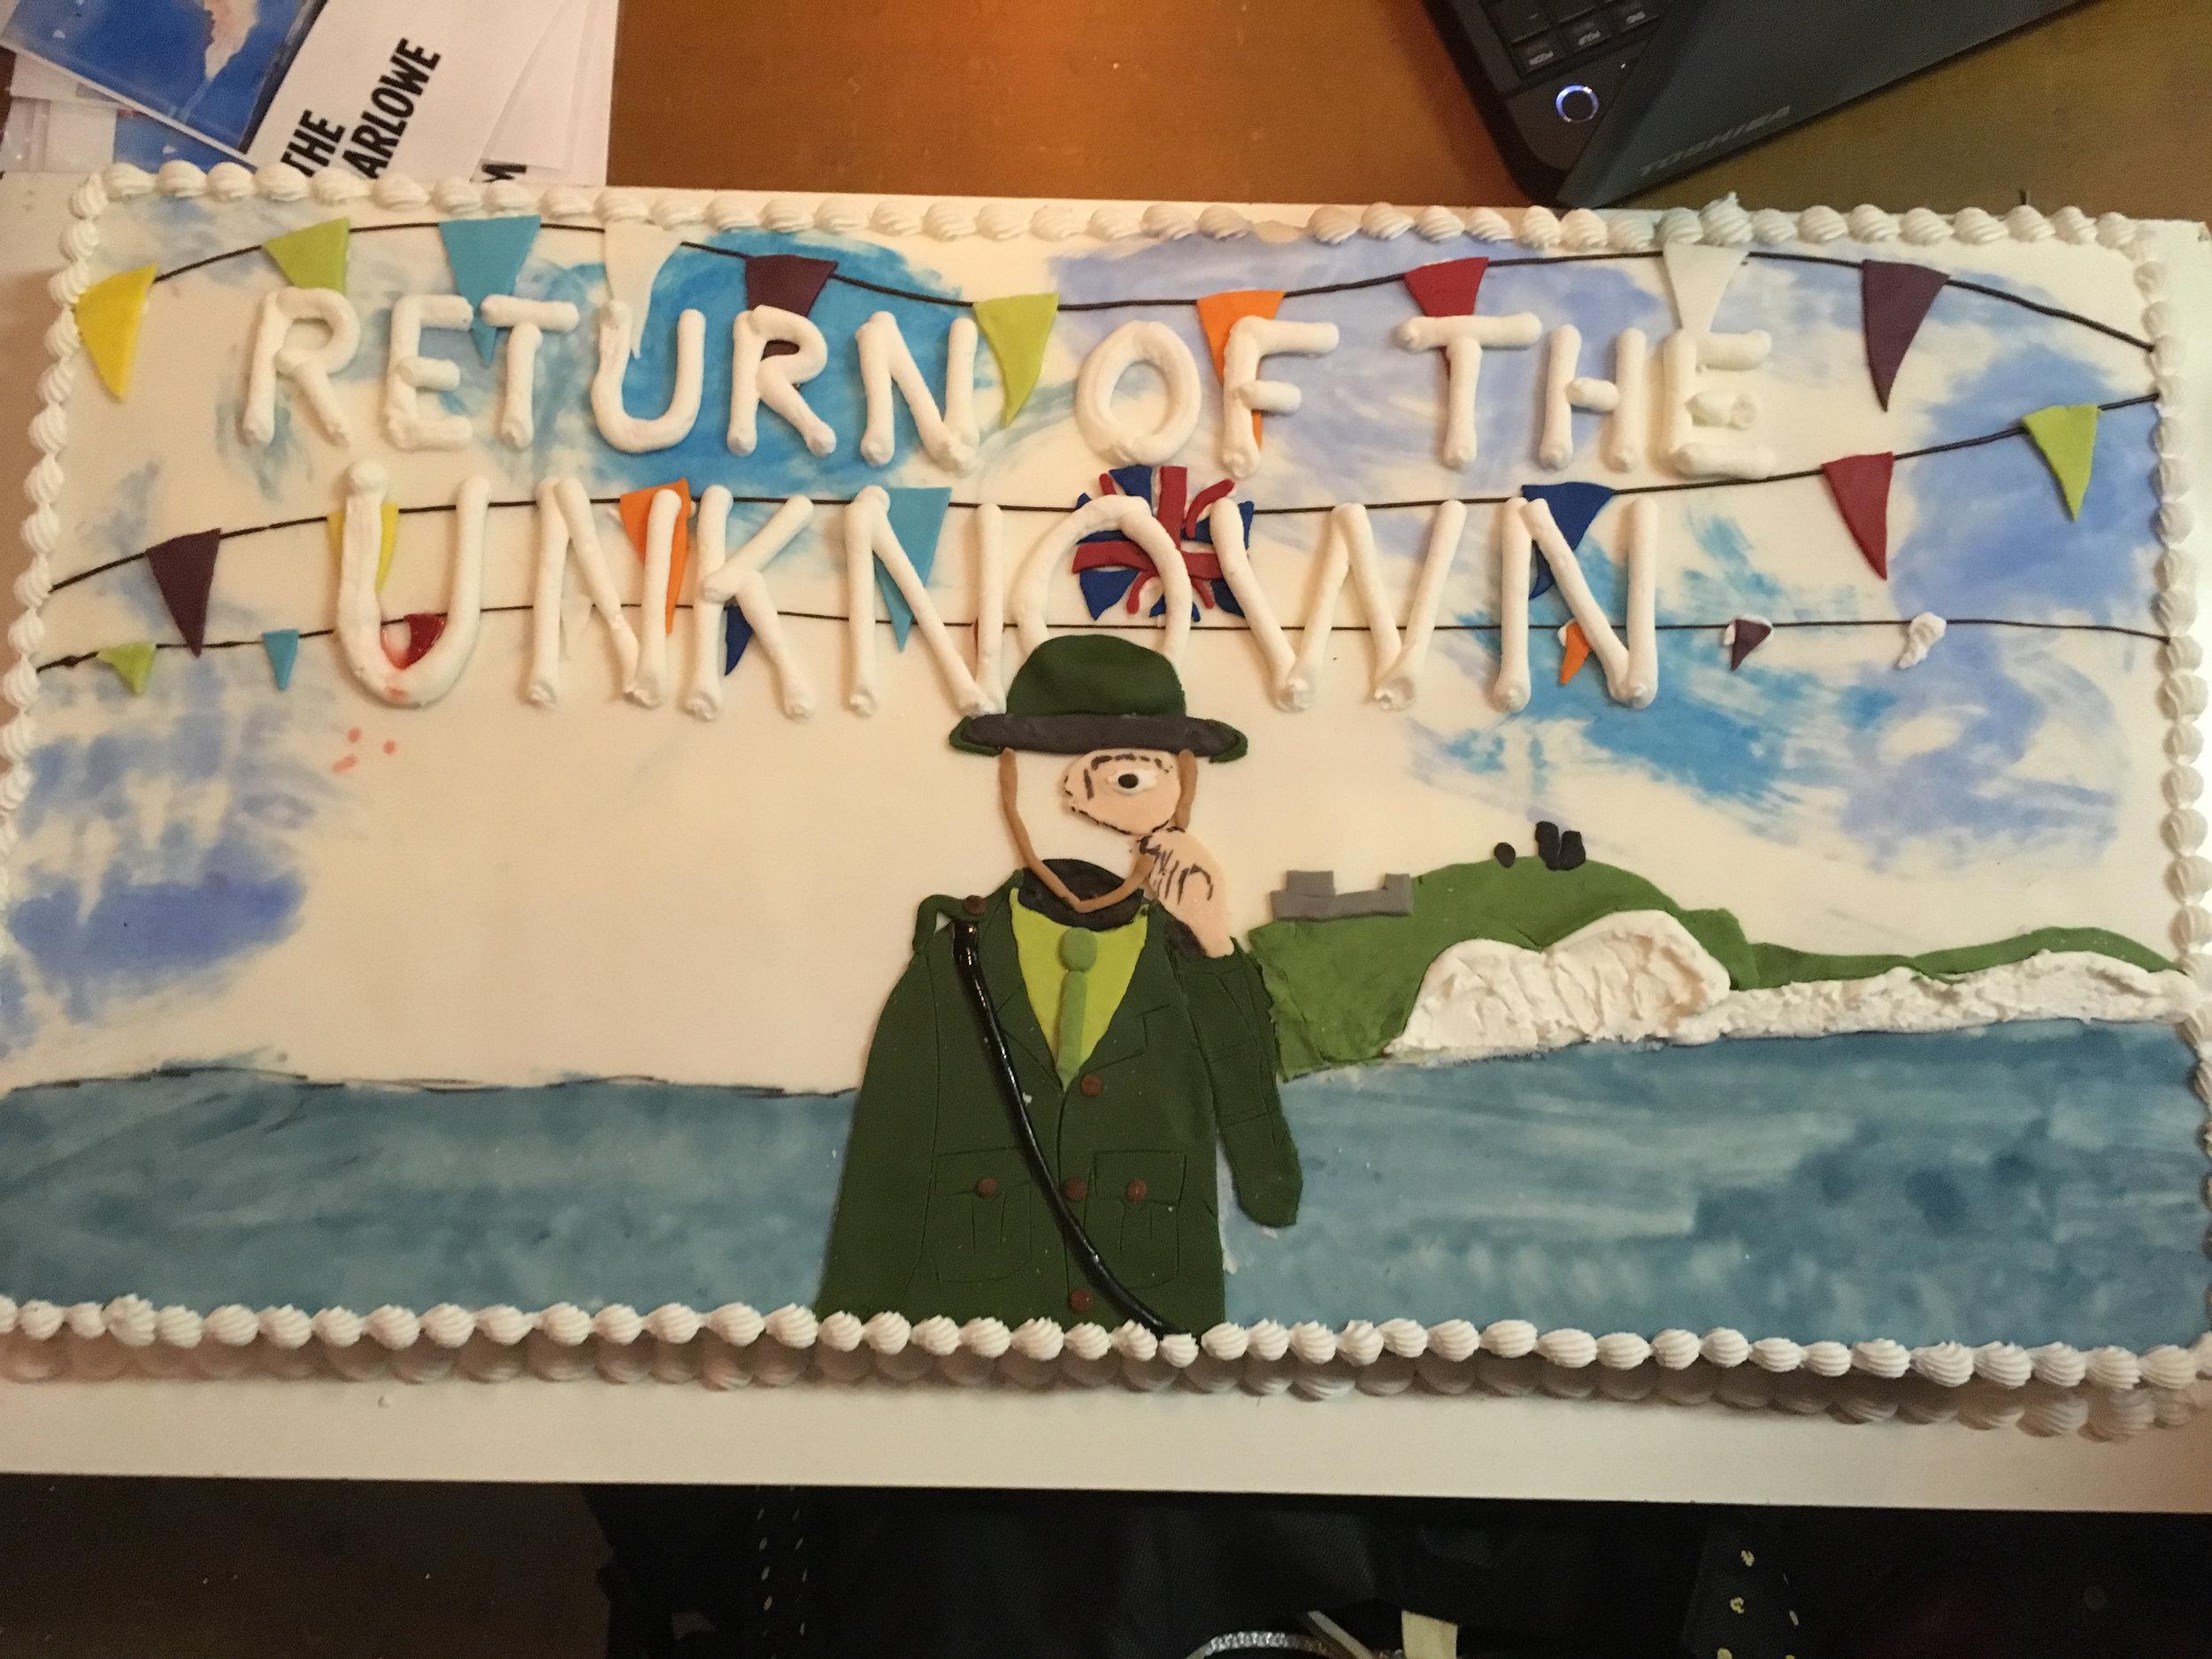 On a cake!